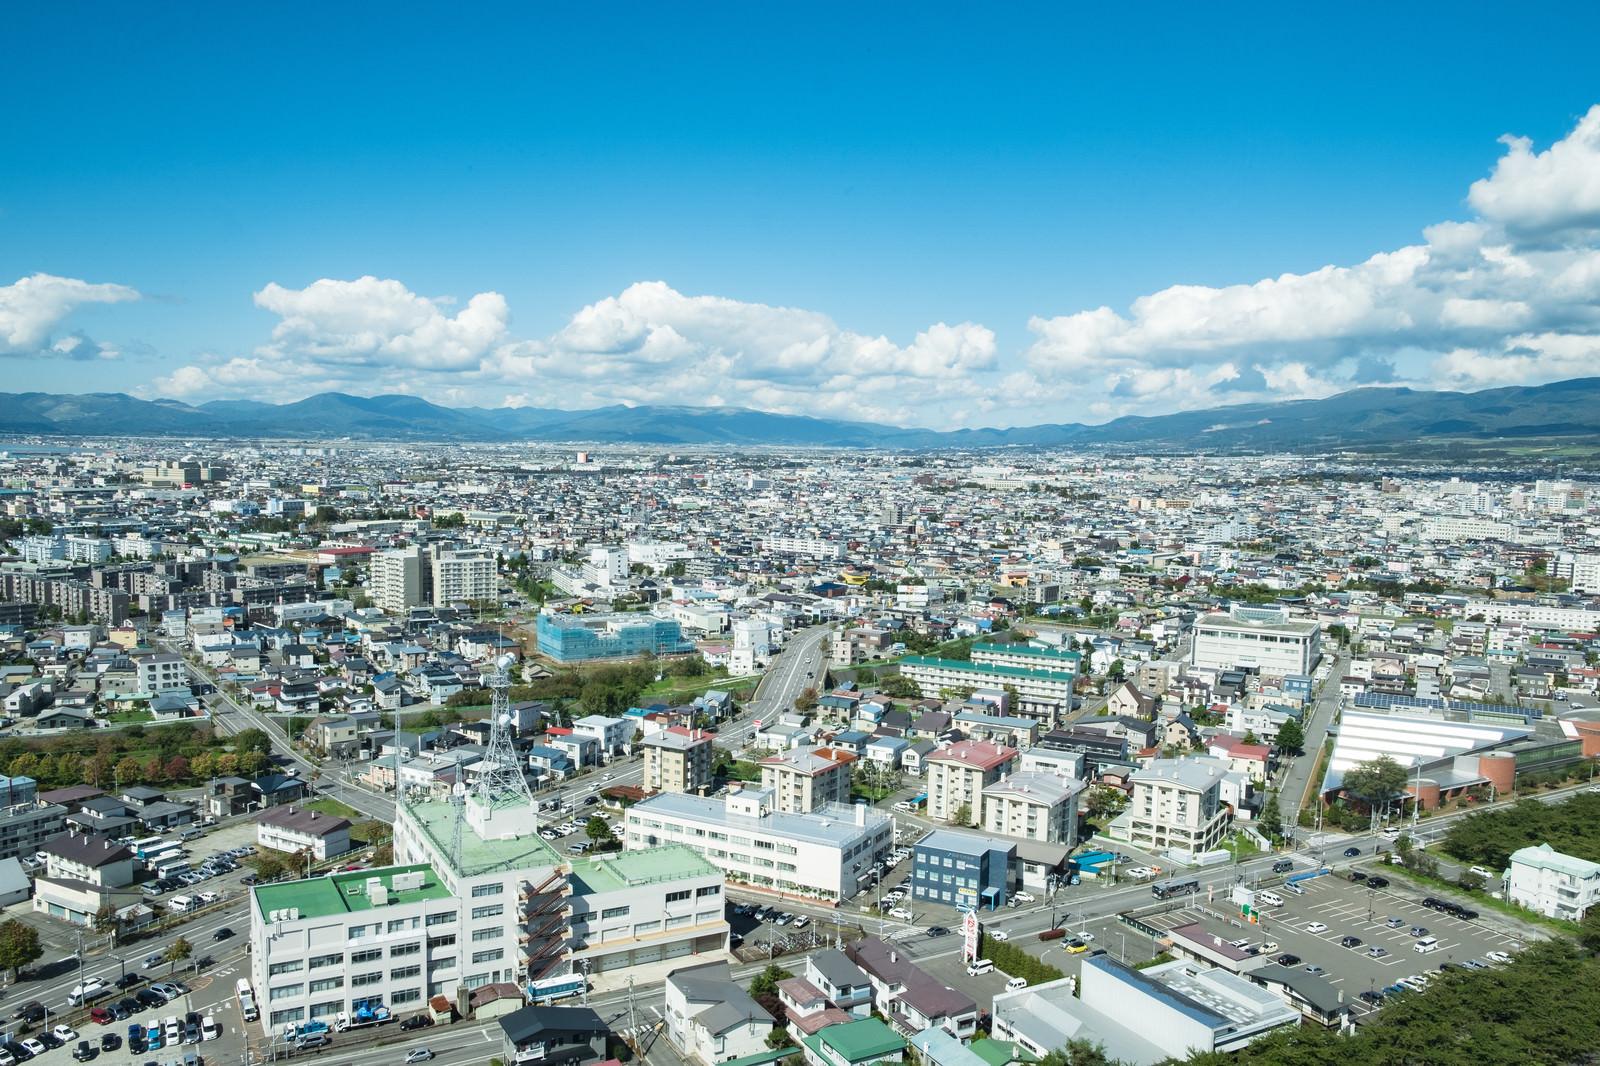 「函館市街」の写真